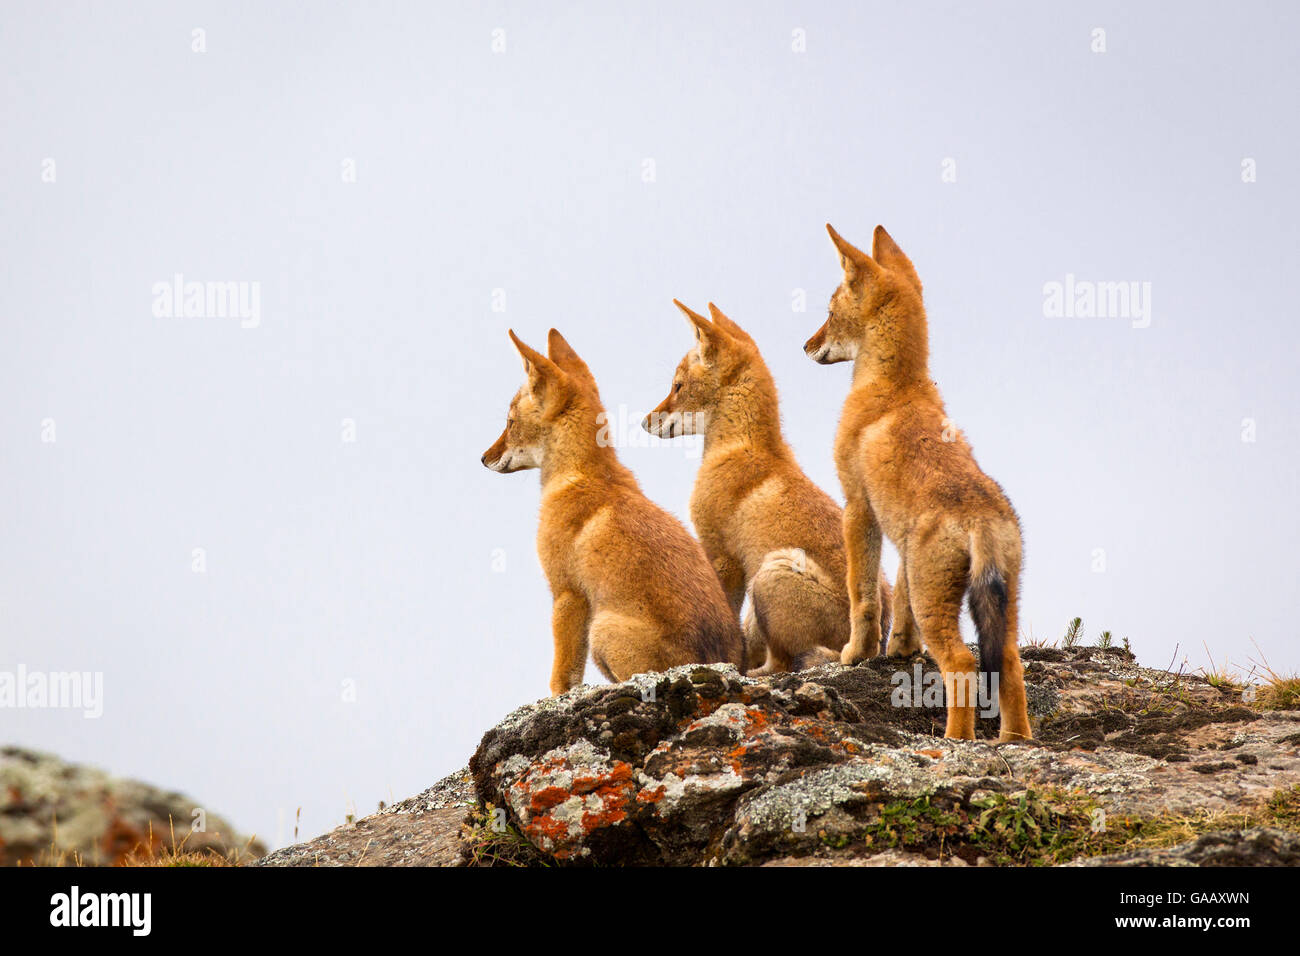 Tres Lobo etíope (Canis simensis) pup esperando que sus padres regresen, Etiopía. Imagen De Stock